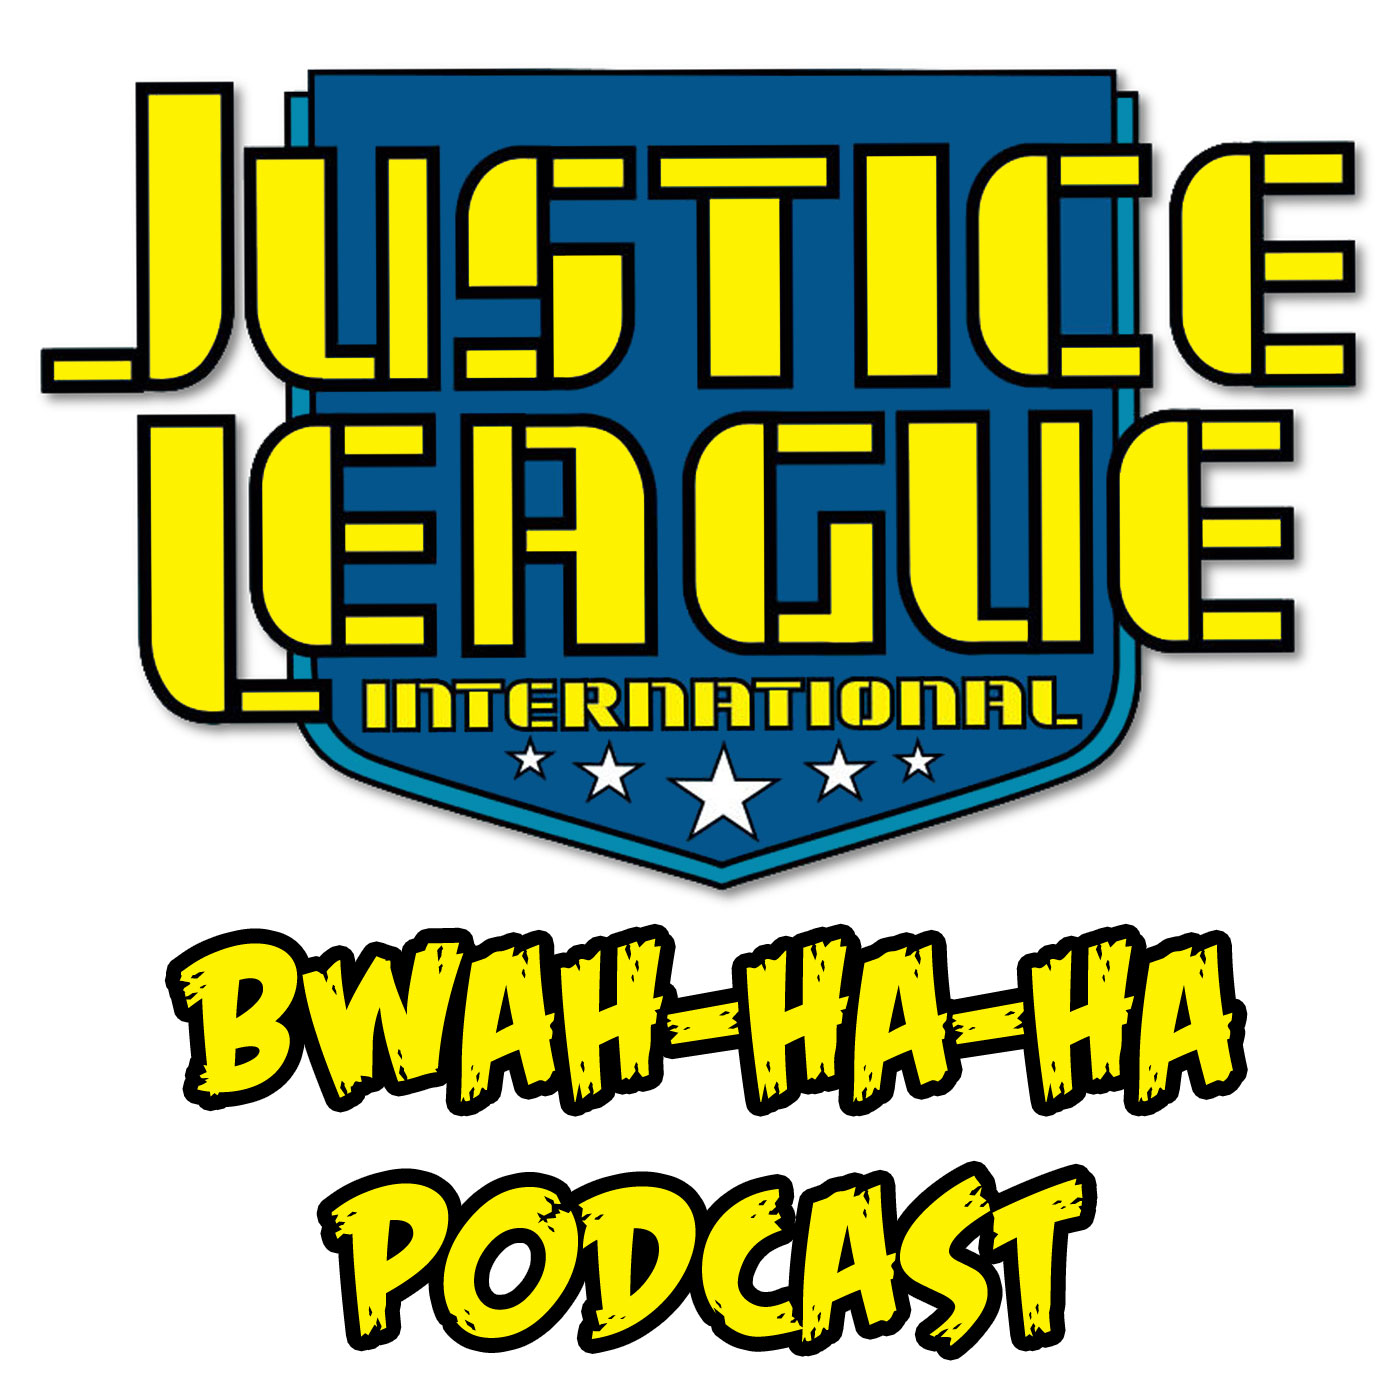 Justice League International: Bwah-Ha-Ha Podcast